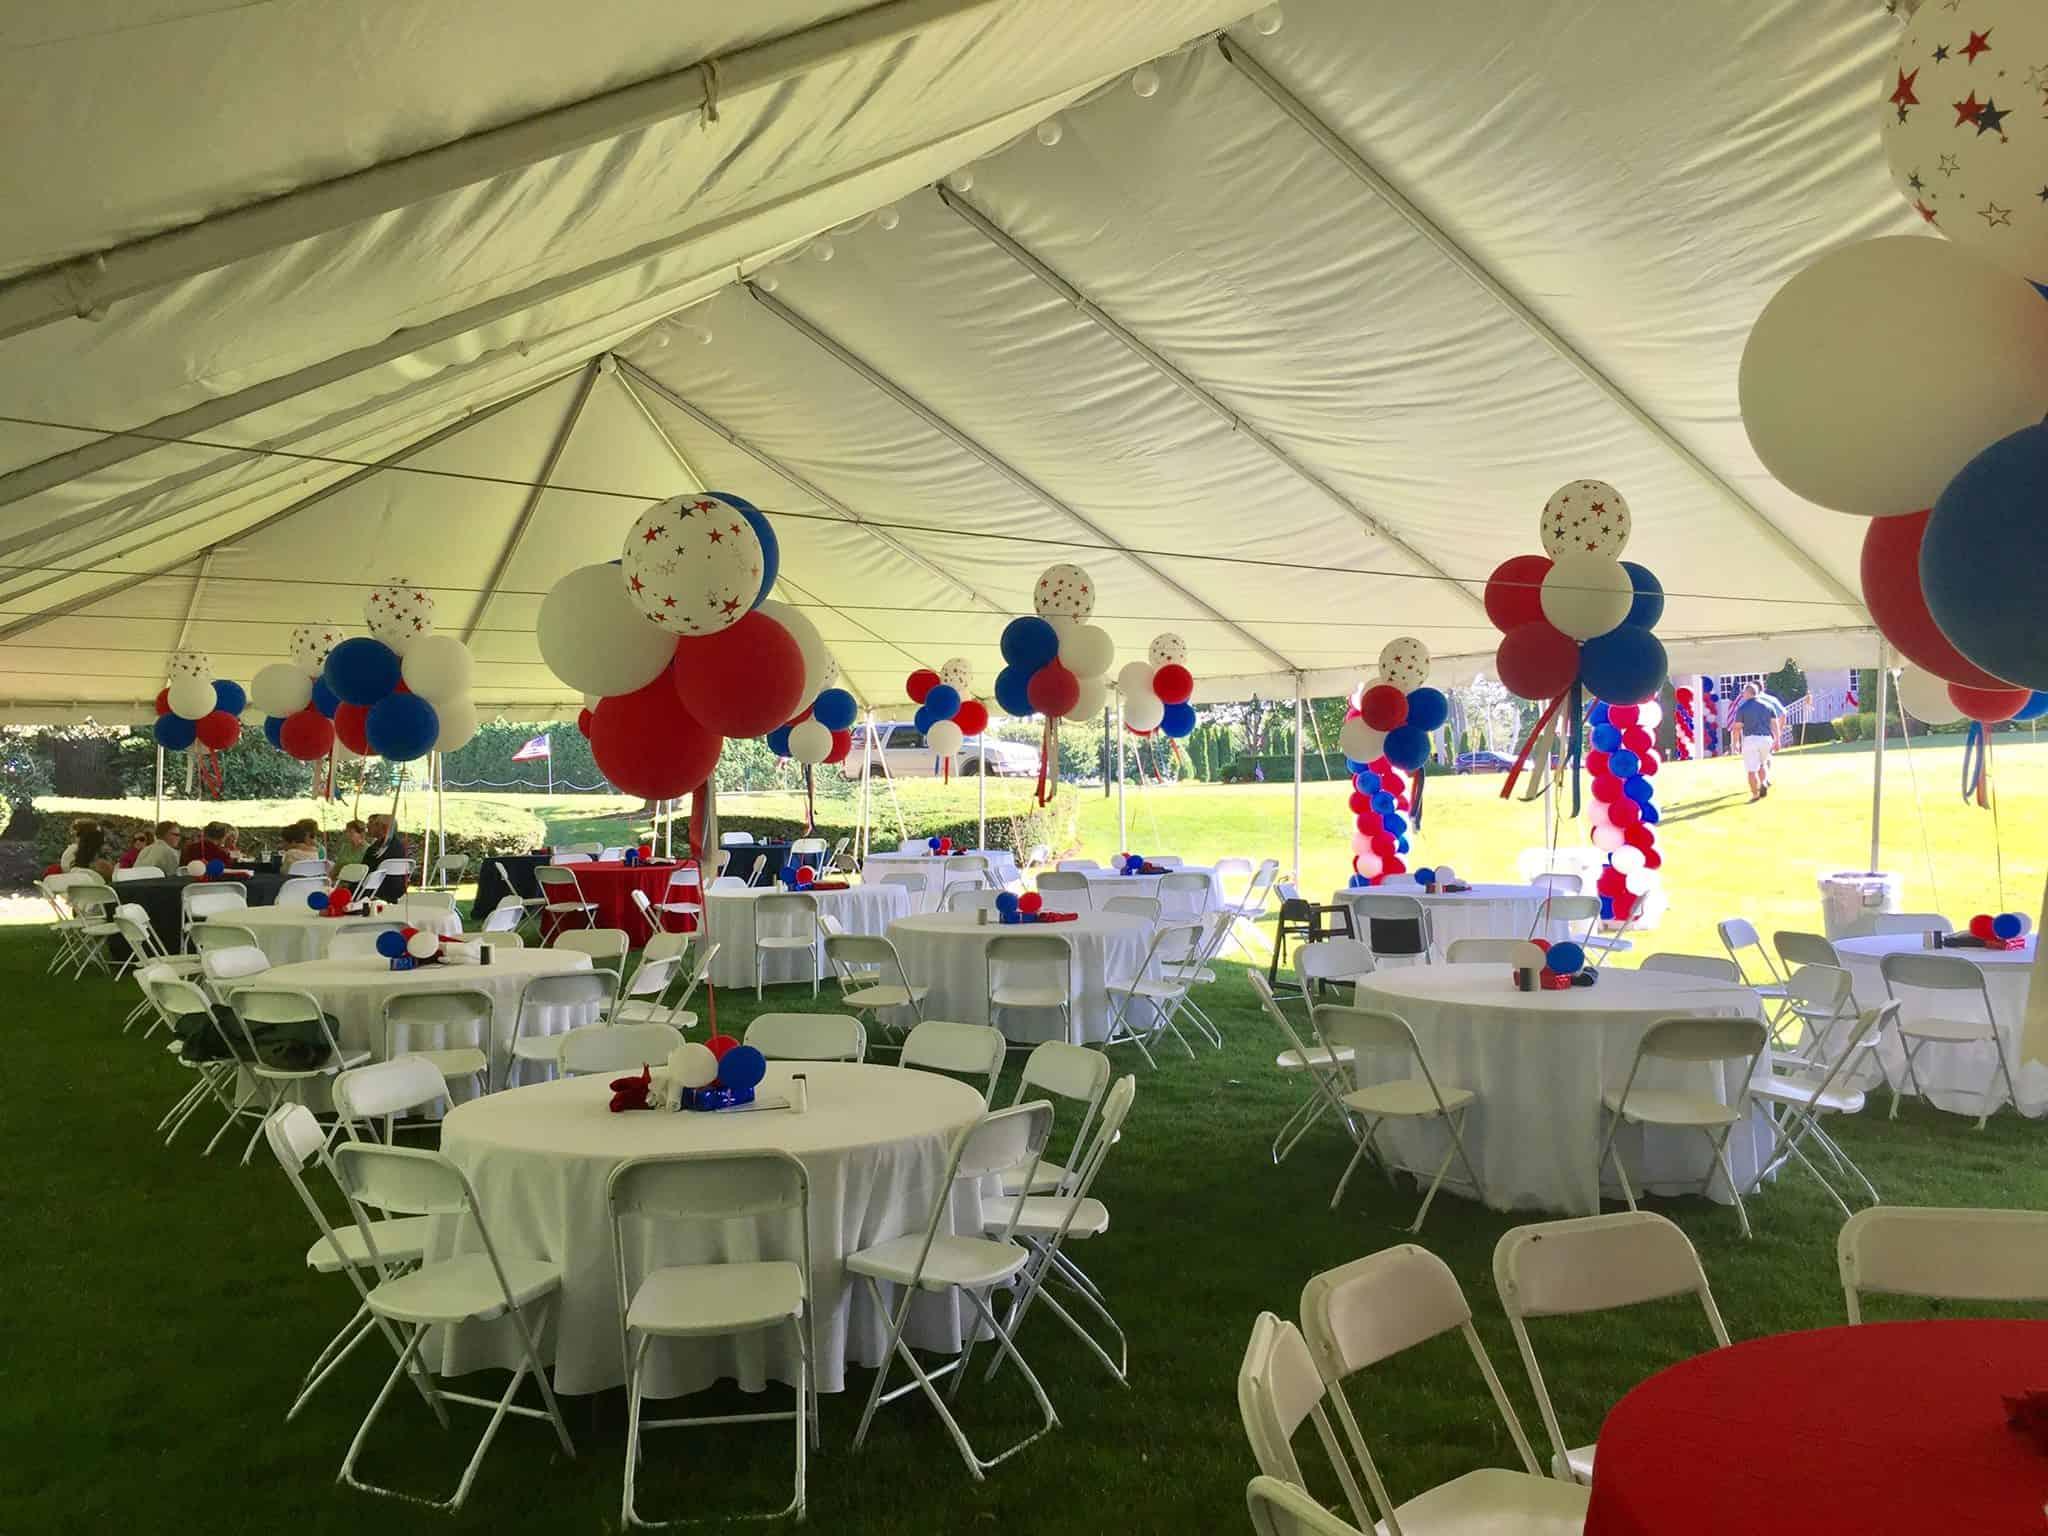 fourth of july tent rental setup